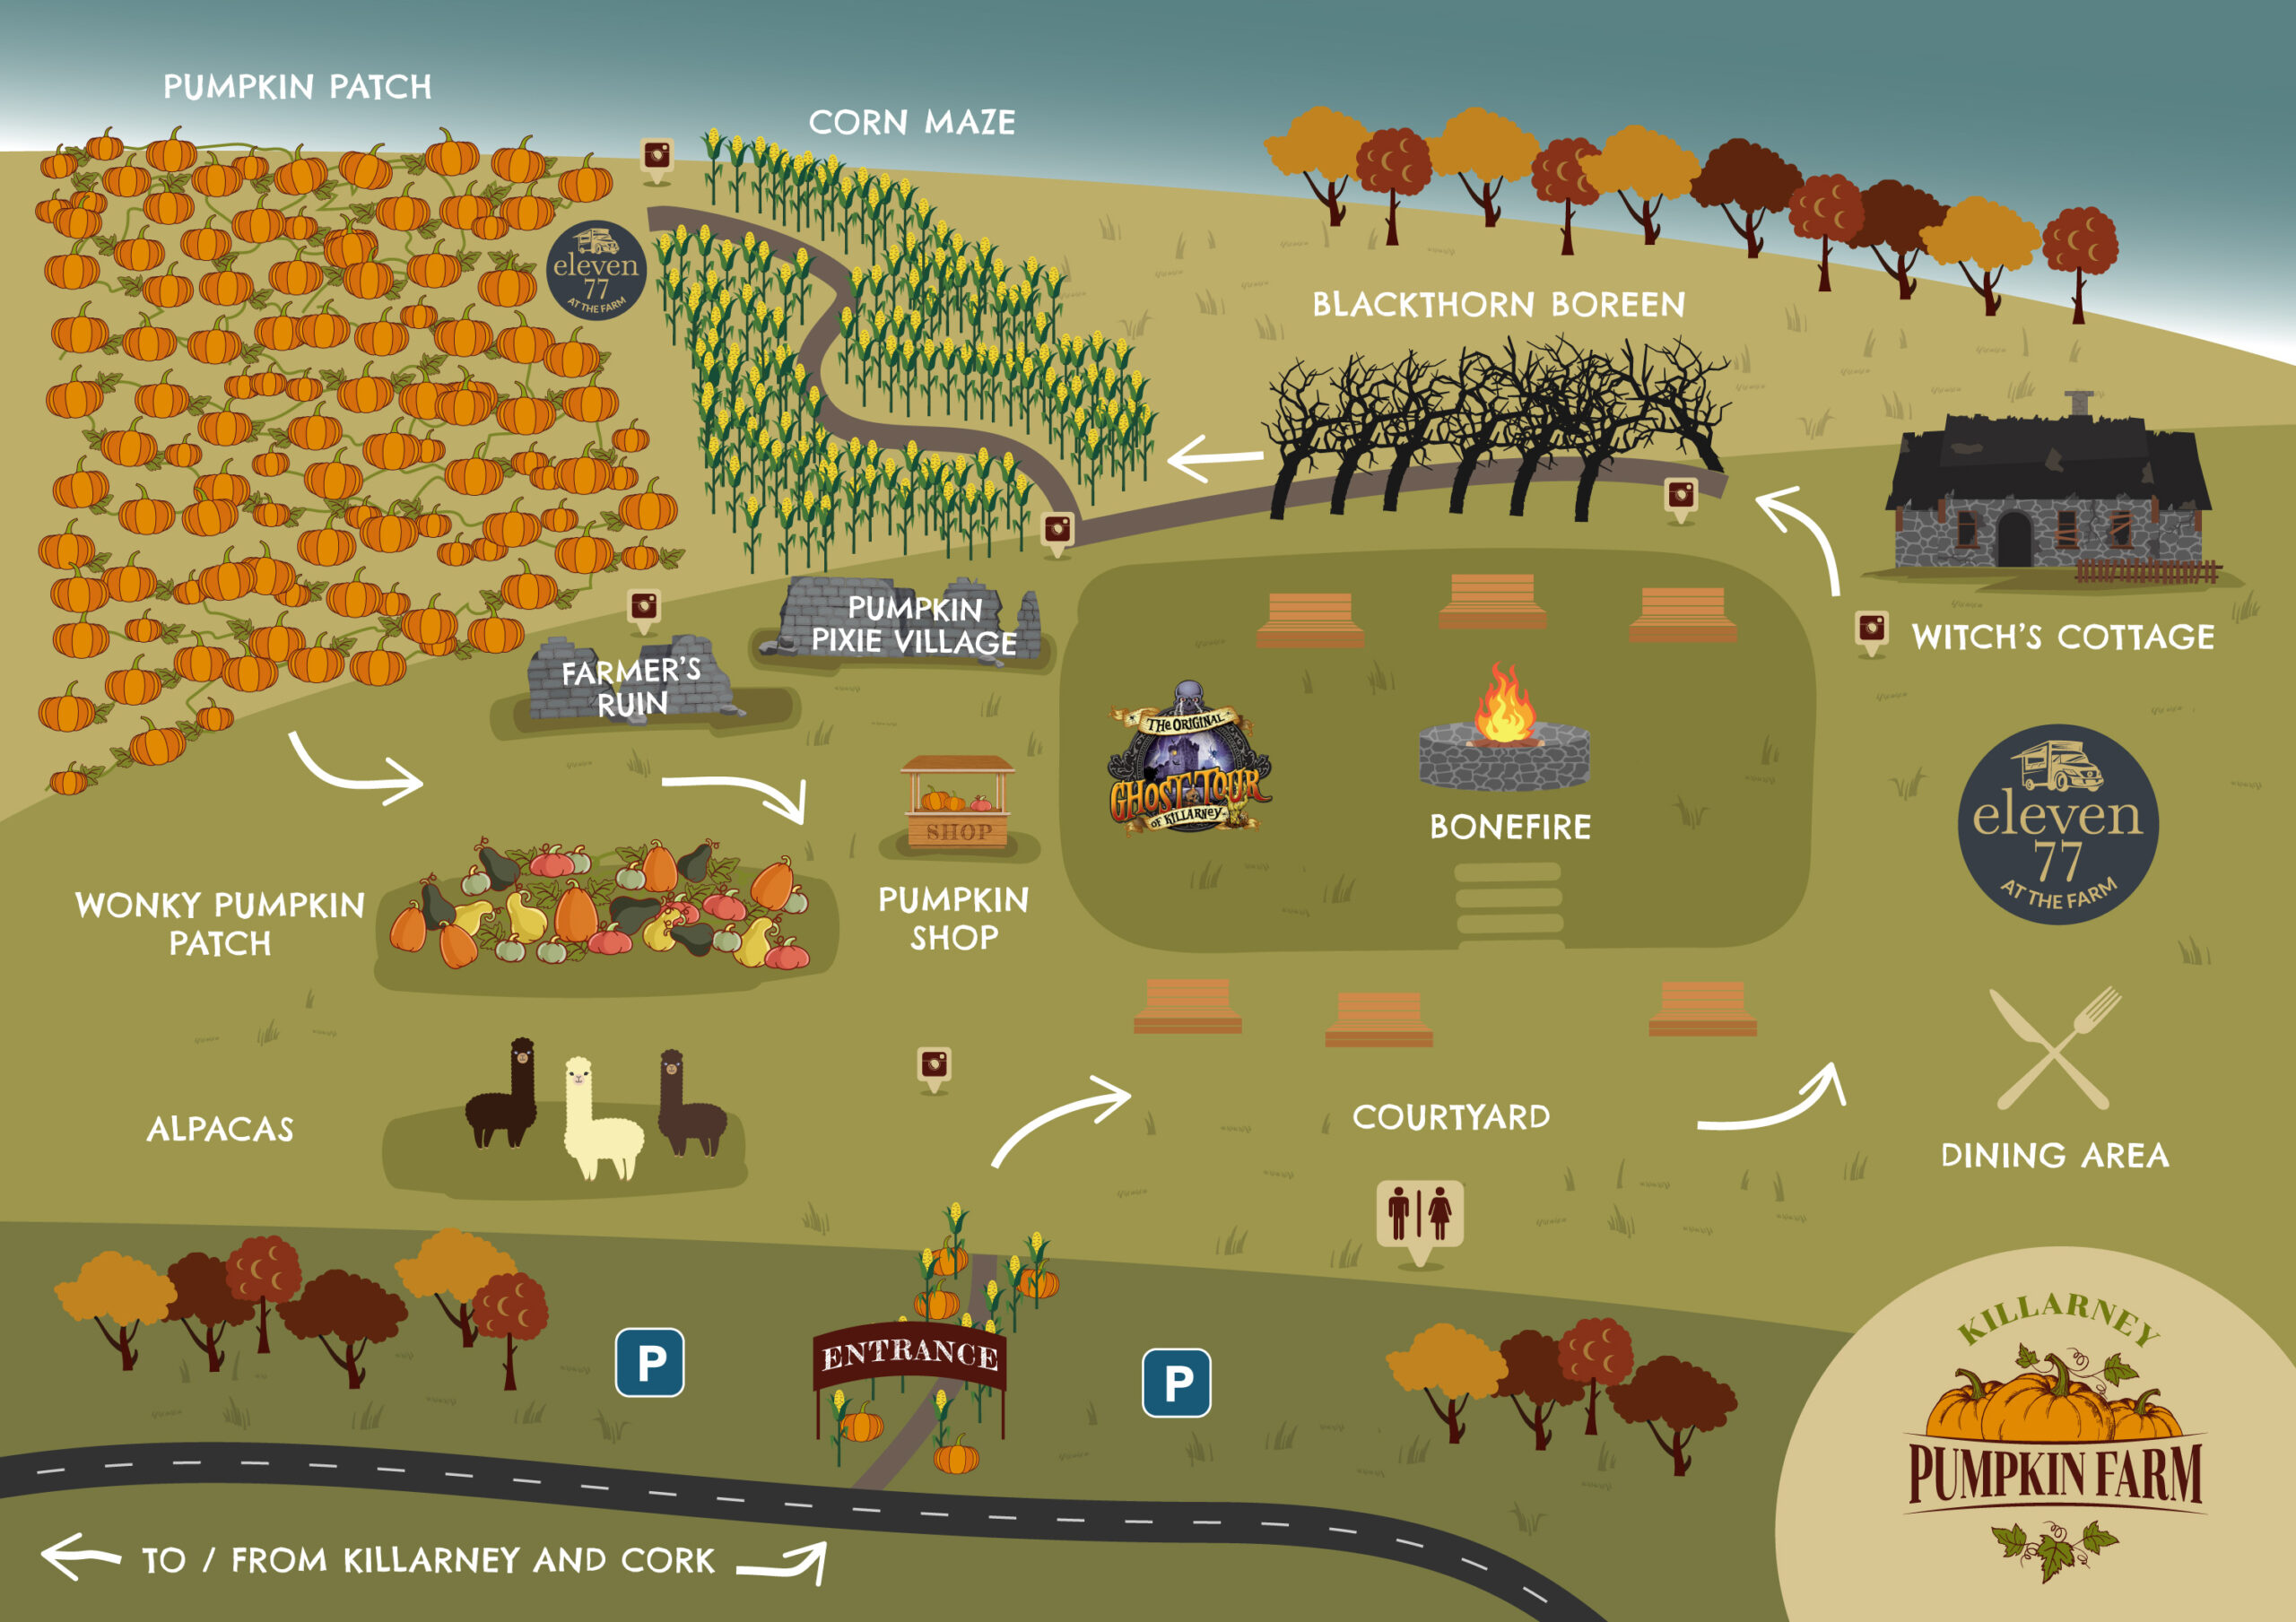 Killarney Pumpkin Farm Map